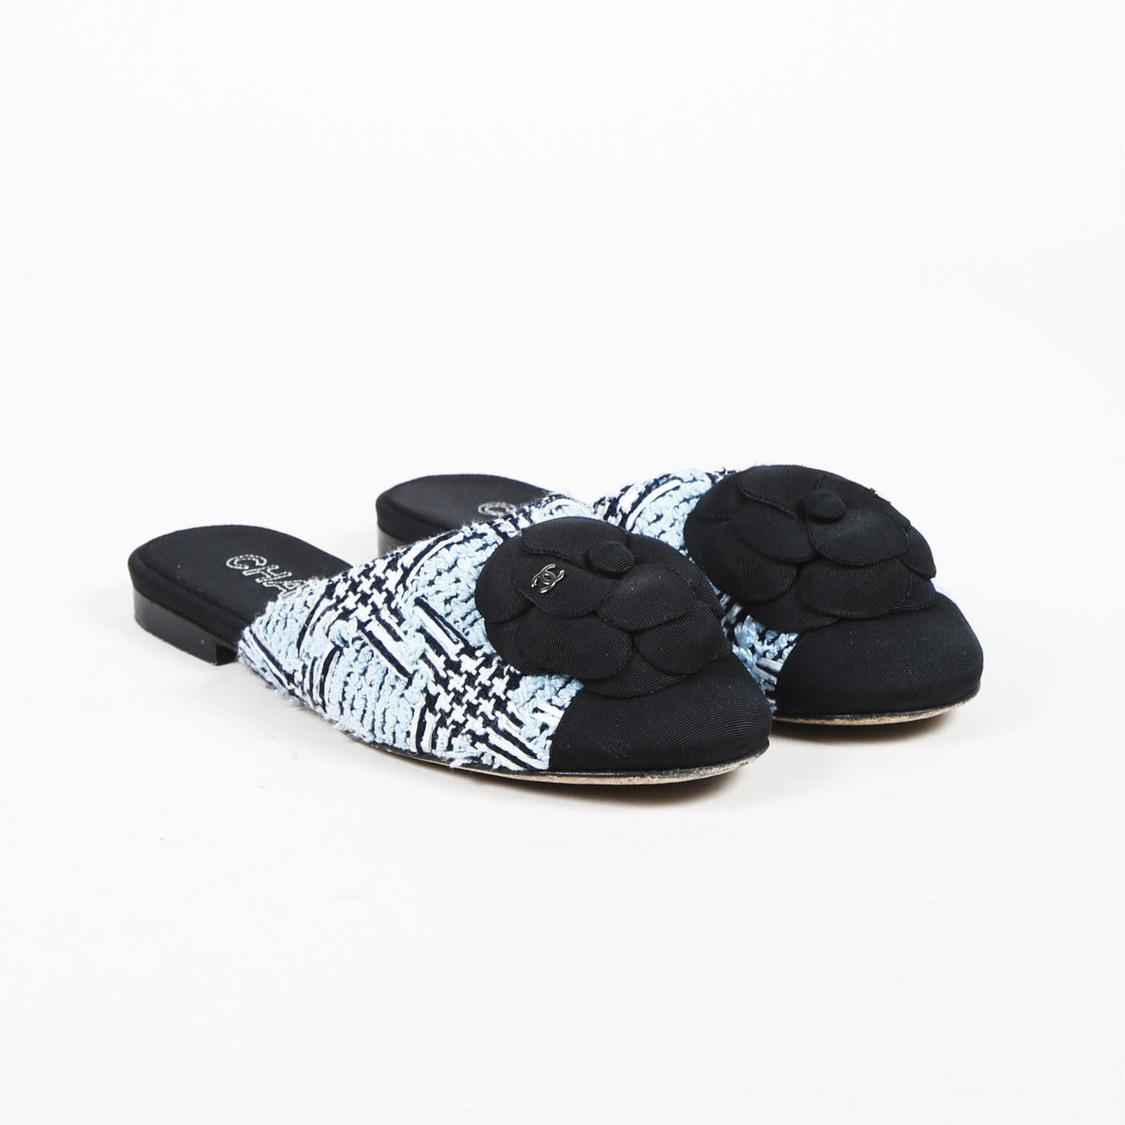 ae1a1b54a5 Chanel Blue & Black Tweed Camellia Cap Toe Mules in Blue - Lyst